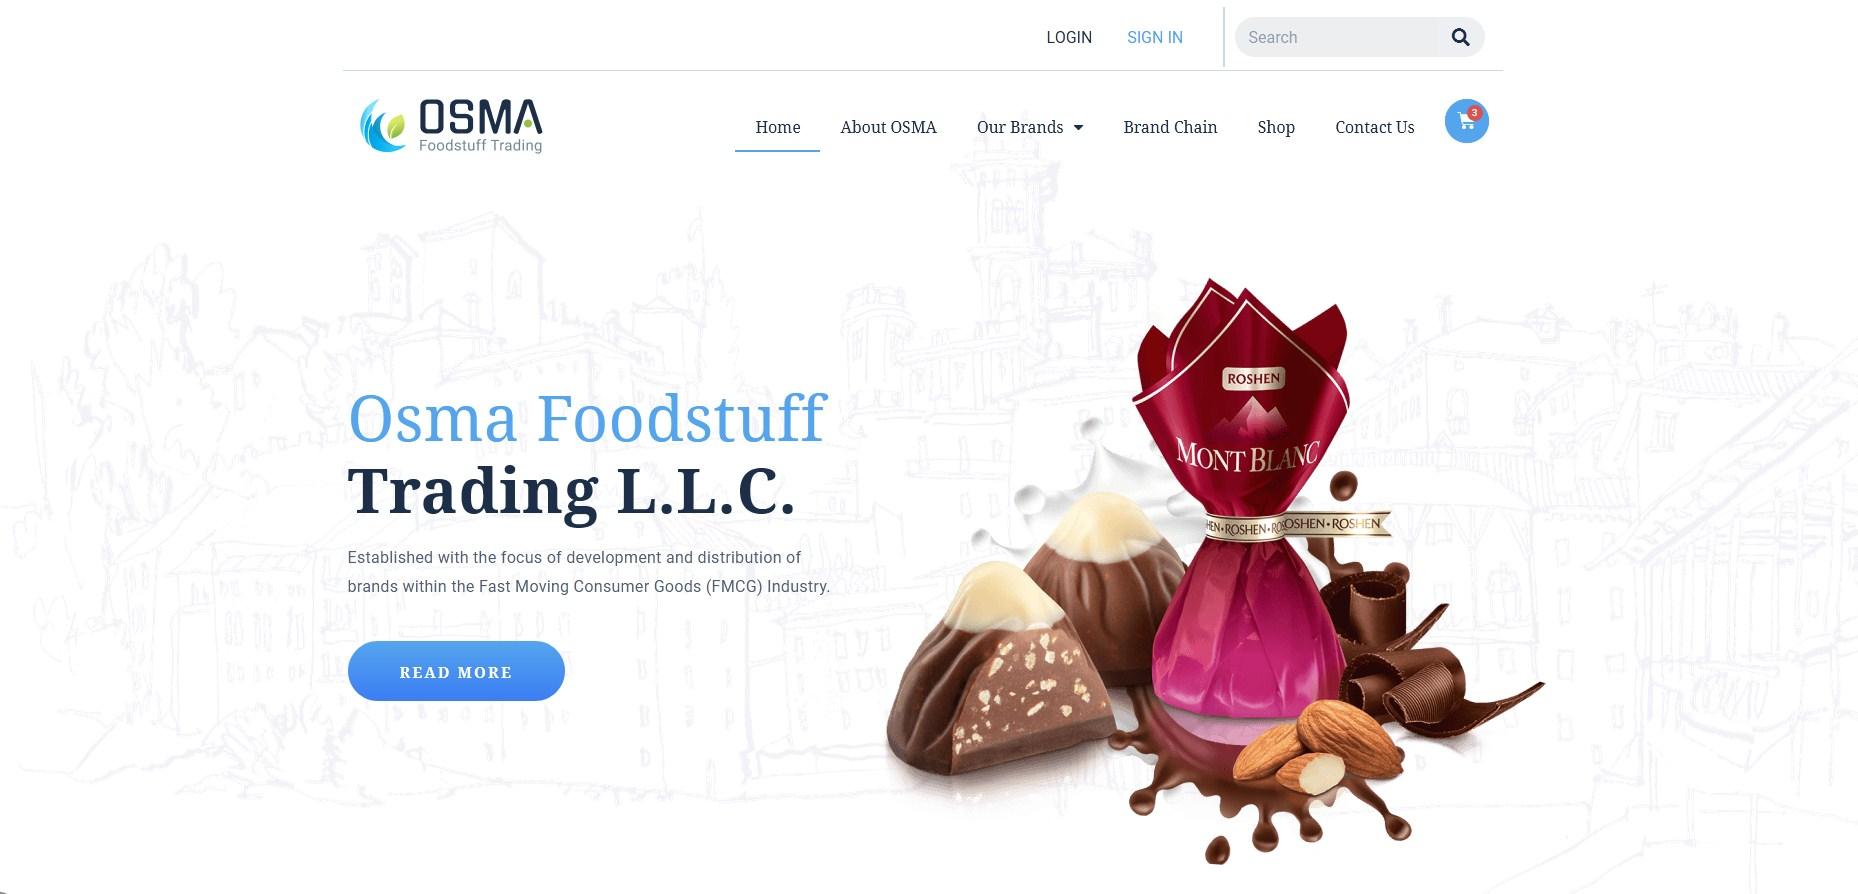 OSMA Web Development Portfolio _Startup N Marketing Digital Marketing, SEO, SEM, PPC